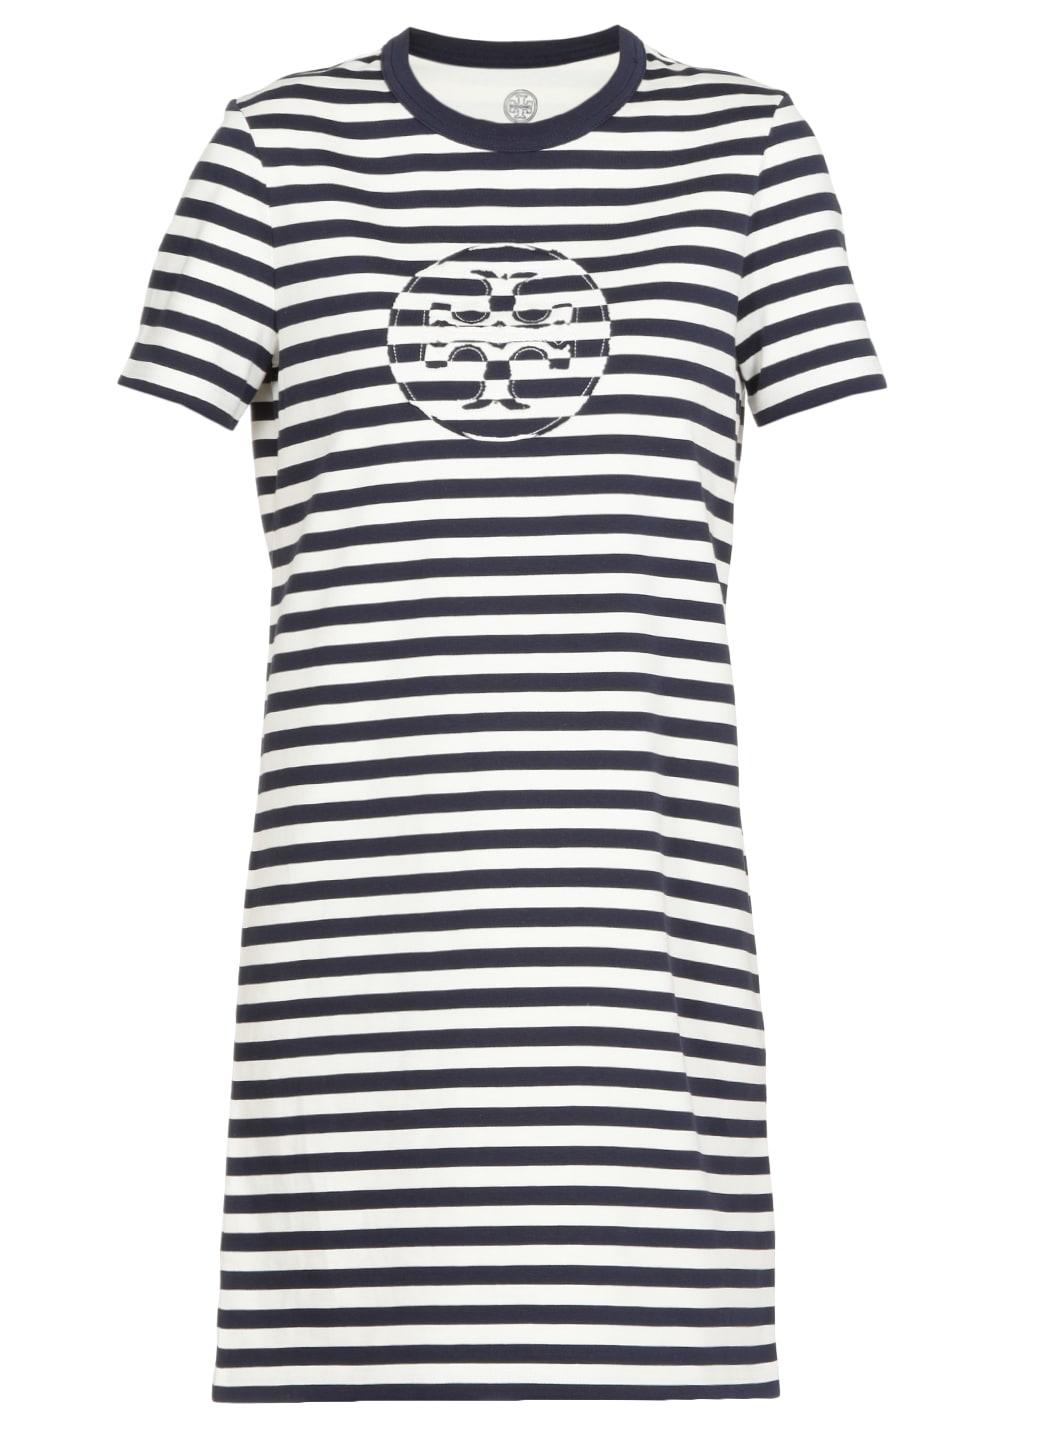 Tory Burch Cotton Striped Dress